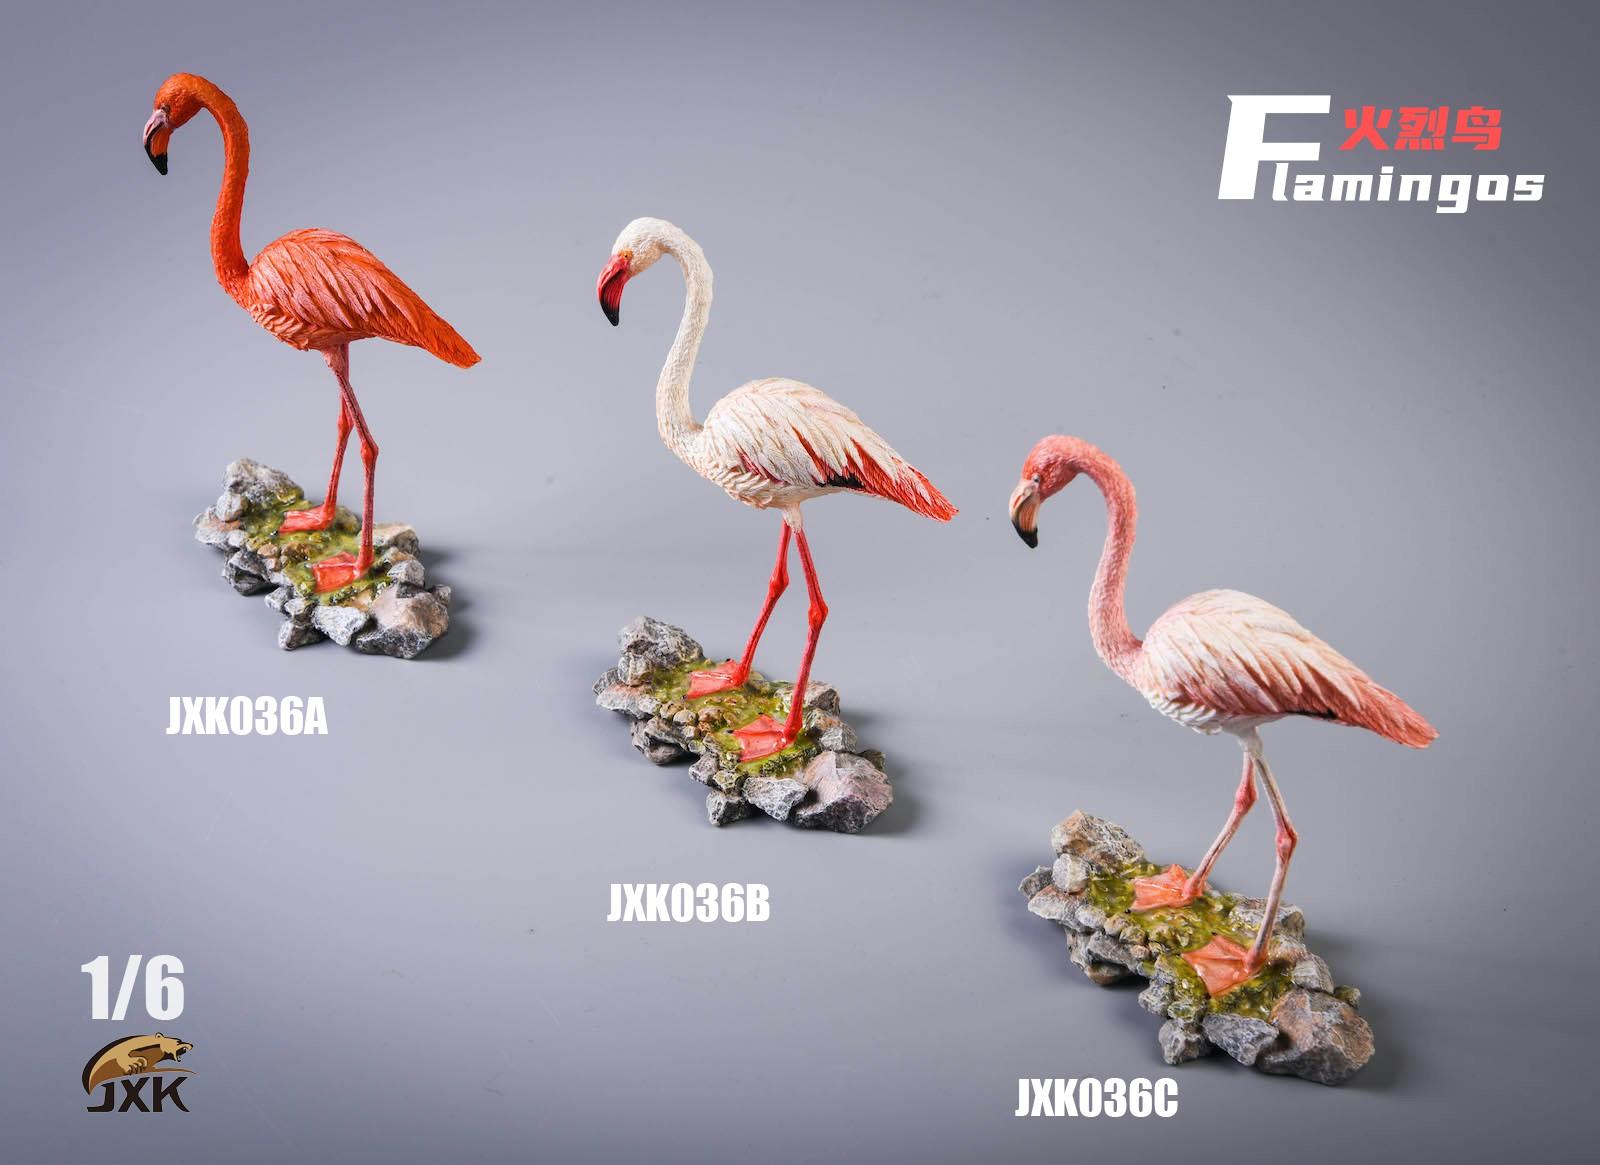 jxk-flamingo04